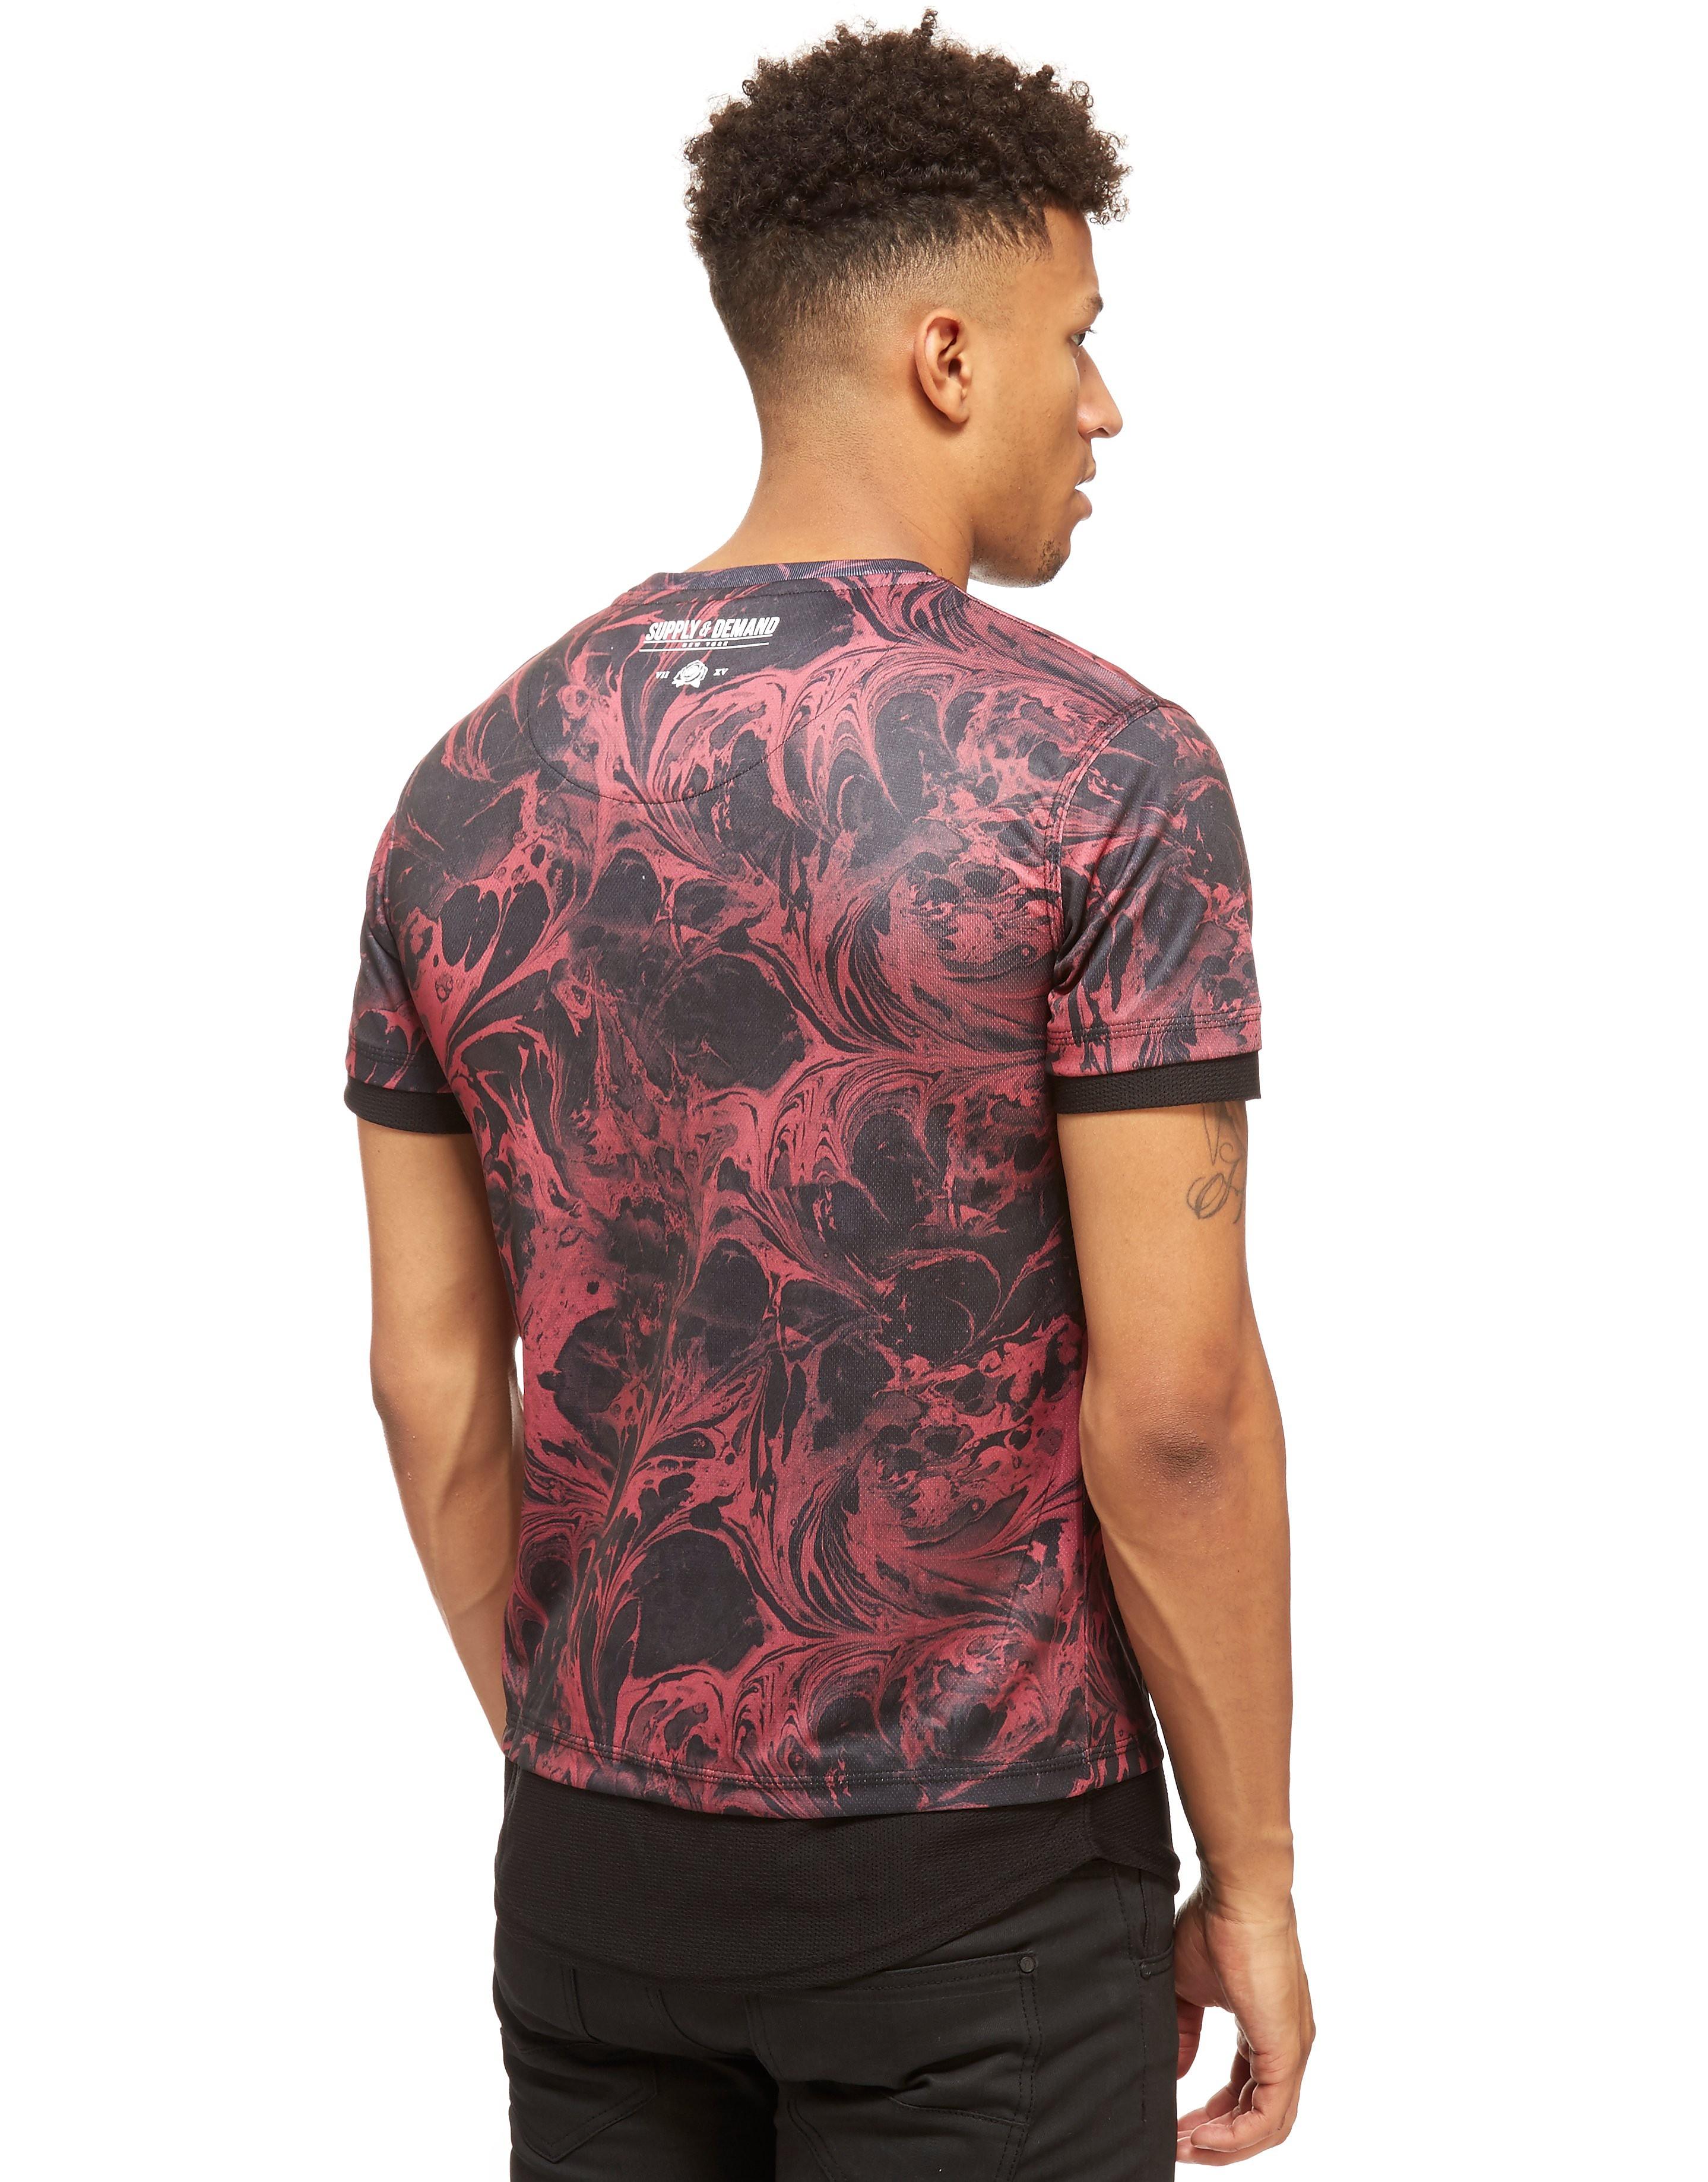 Supply & Demand Slider T-Shirt